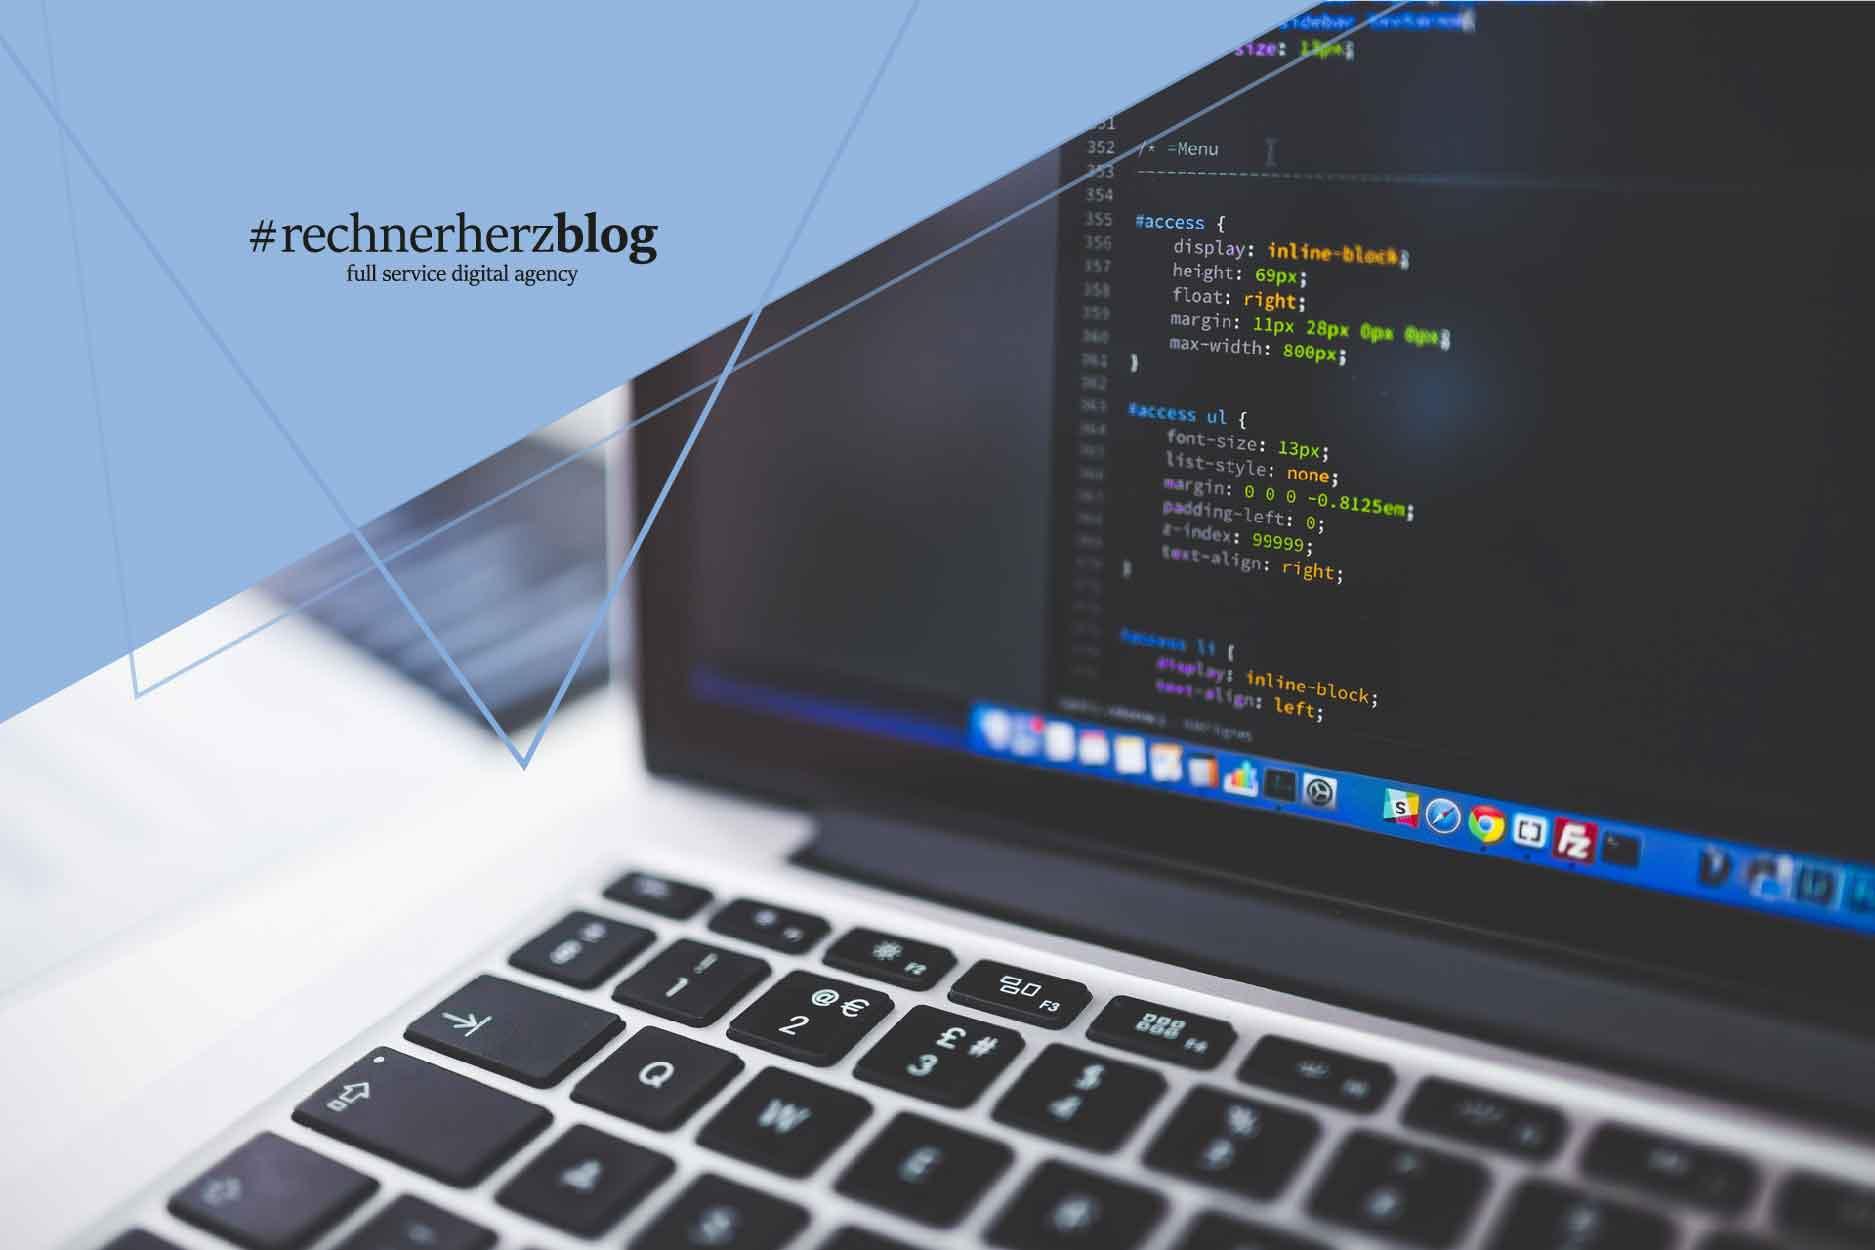 React/Redux Design Decisions ⋆ rechnerherz